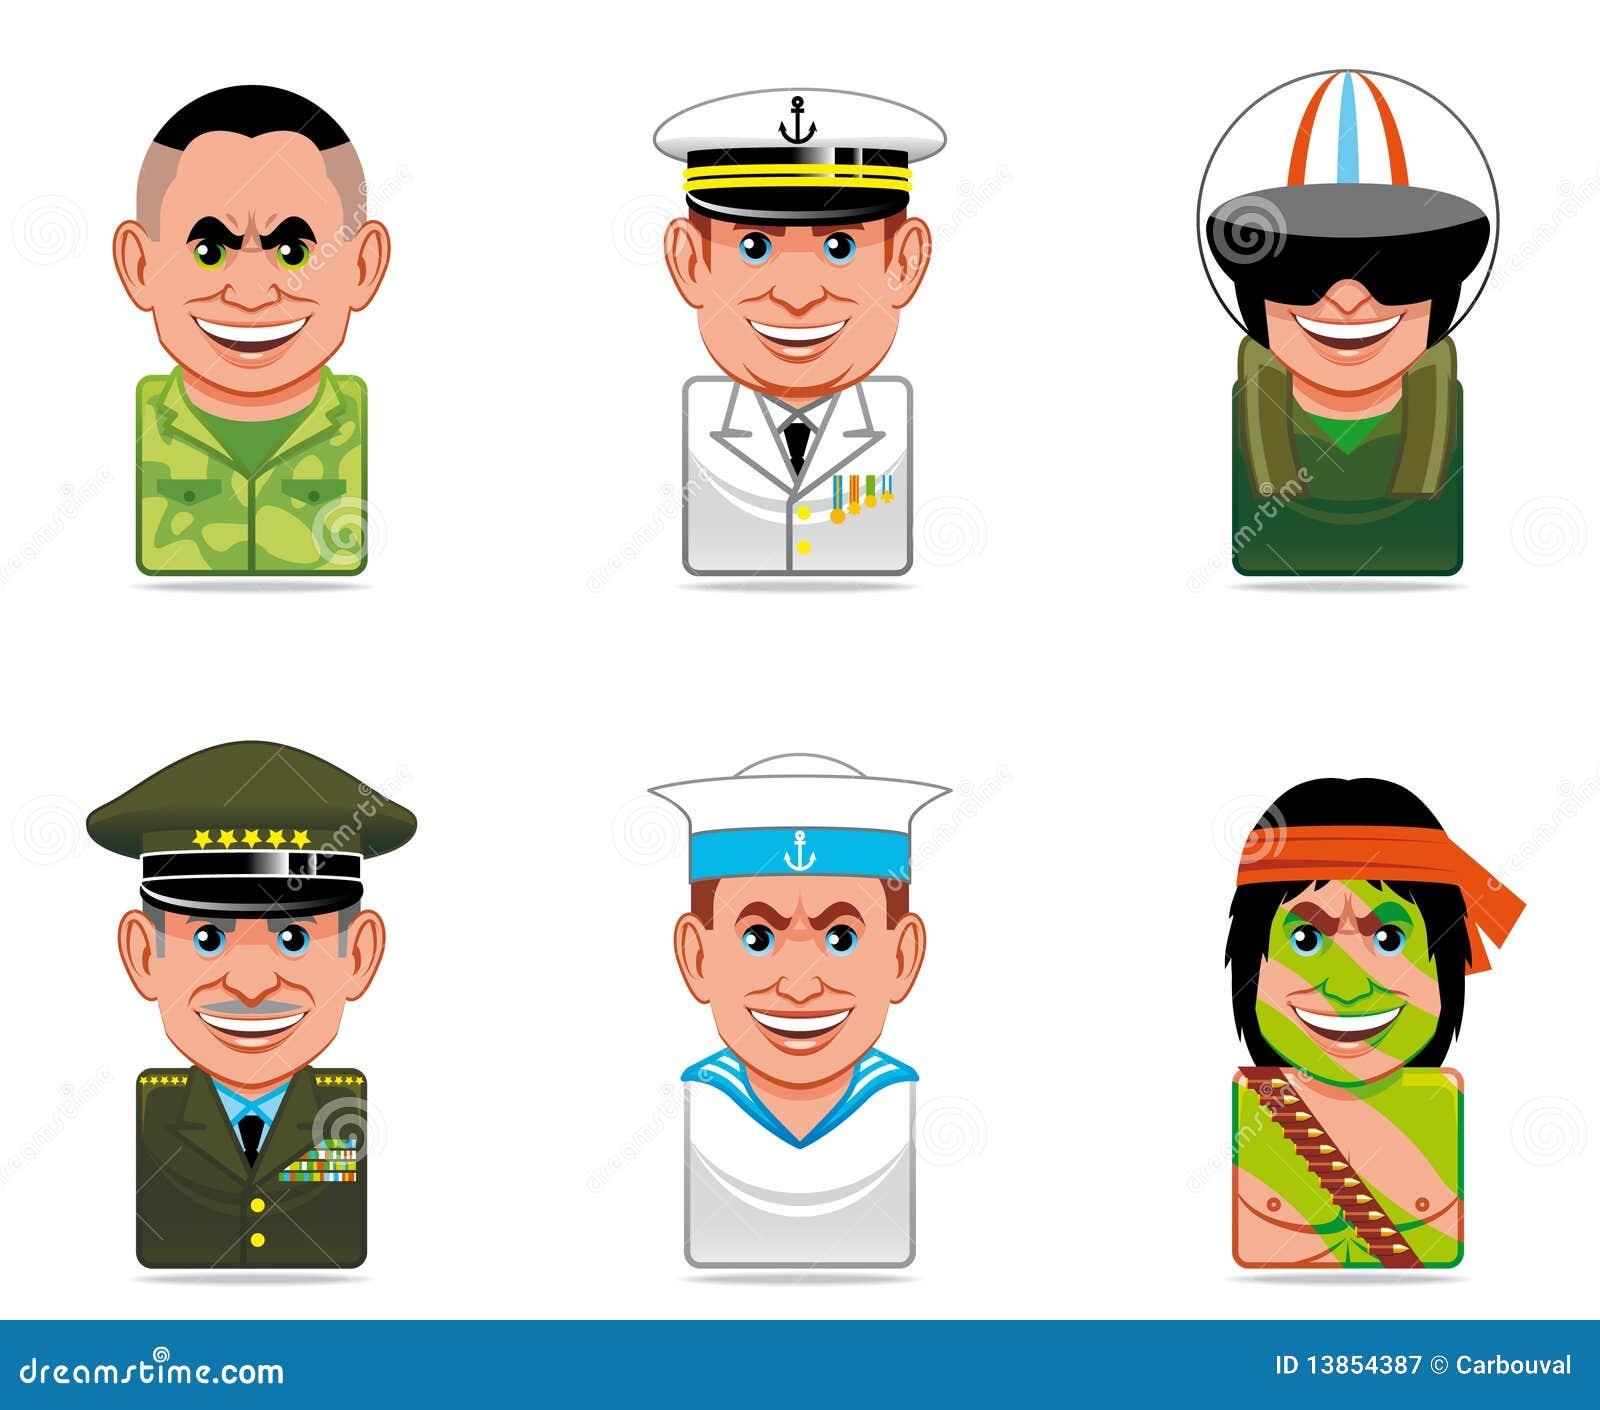 Cartoon Army Stock Illustrations 26 785 Cartoon Army Stock Illustrations Vectors Clipart Dreamstime